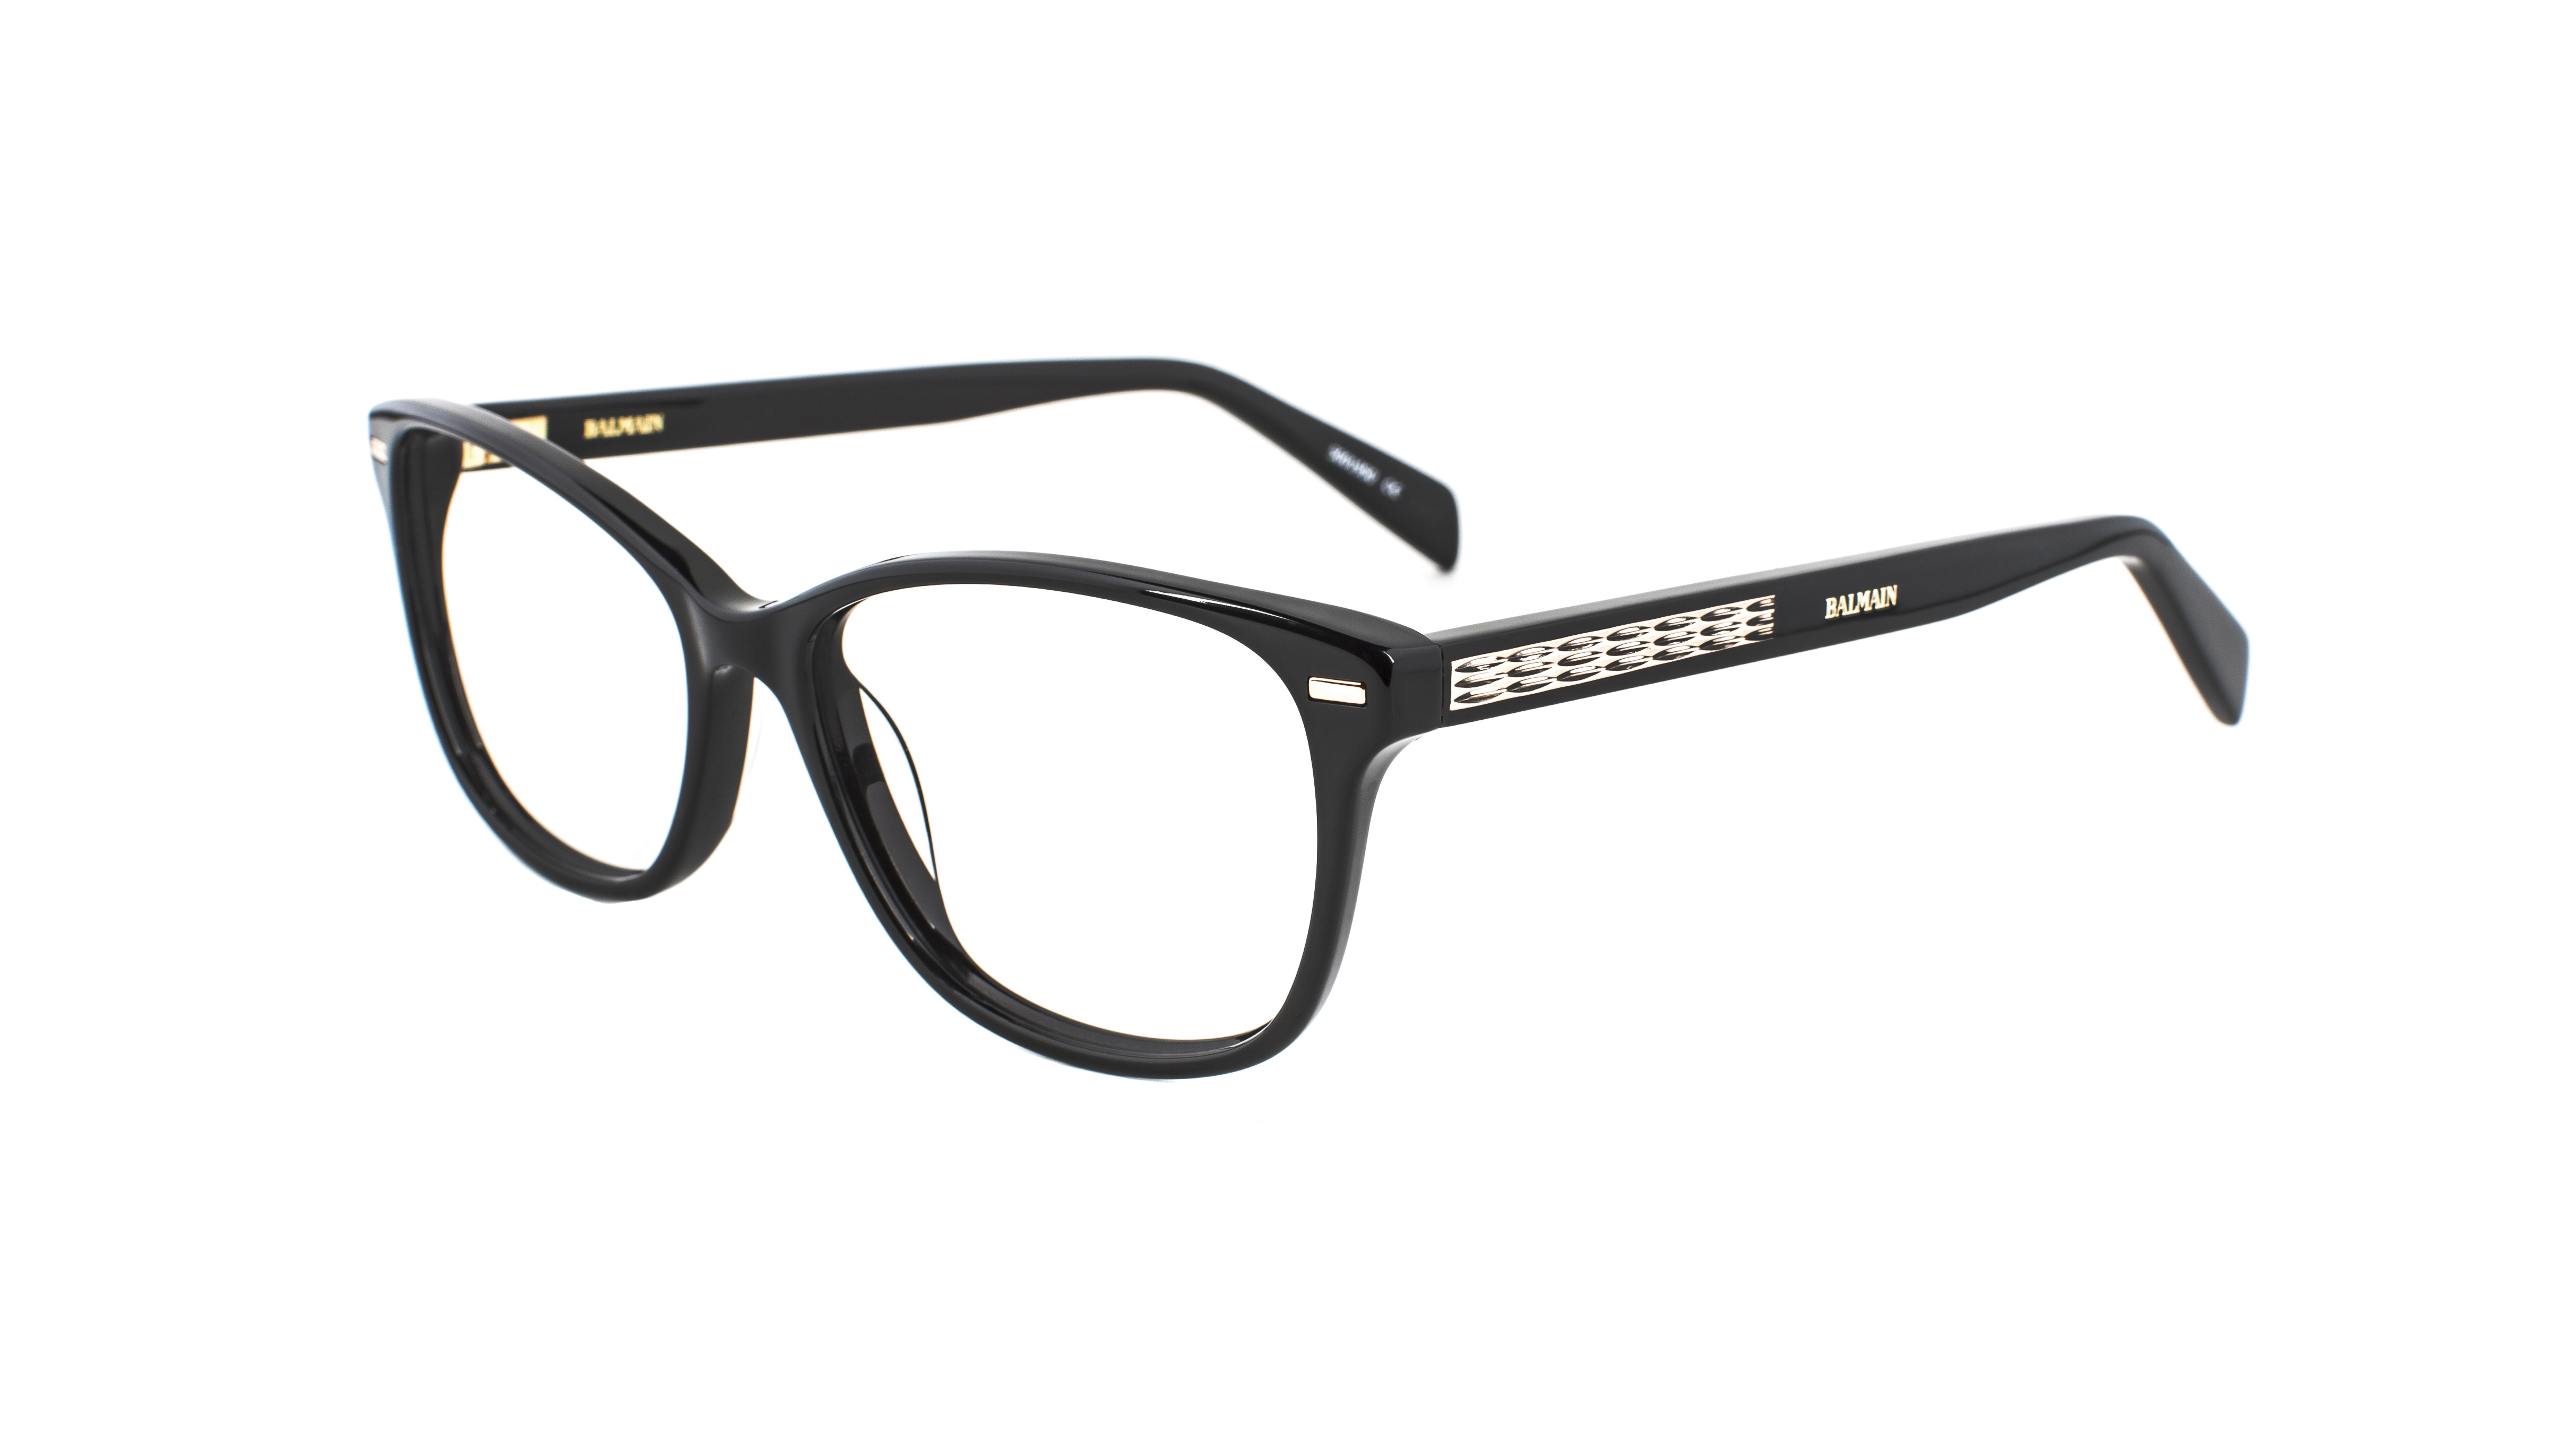 Balmain x Specsavers BL1524S 30570764 - RRP 2 pairs single vision $459 (2)